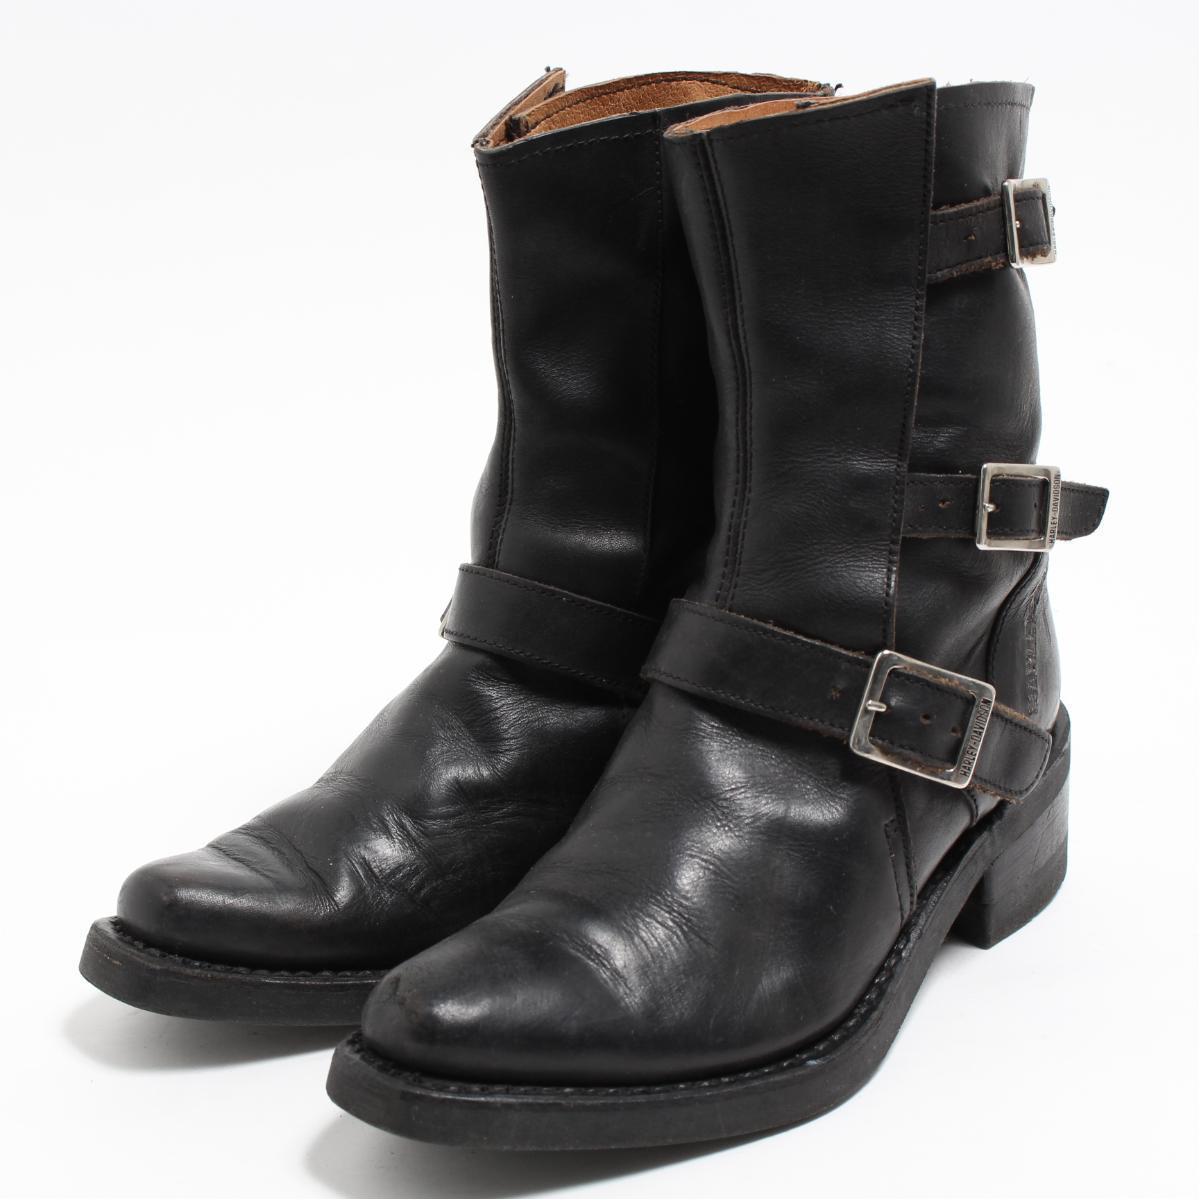 47901532b73 Harley-Davidson Harley-Davidson Tomi Bell dollar boots Lady's 22.0cm  /boo7132